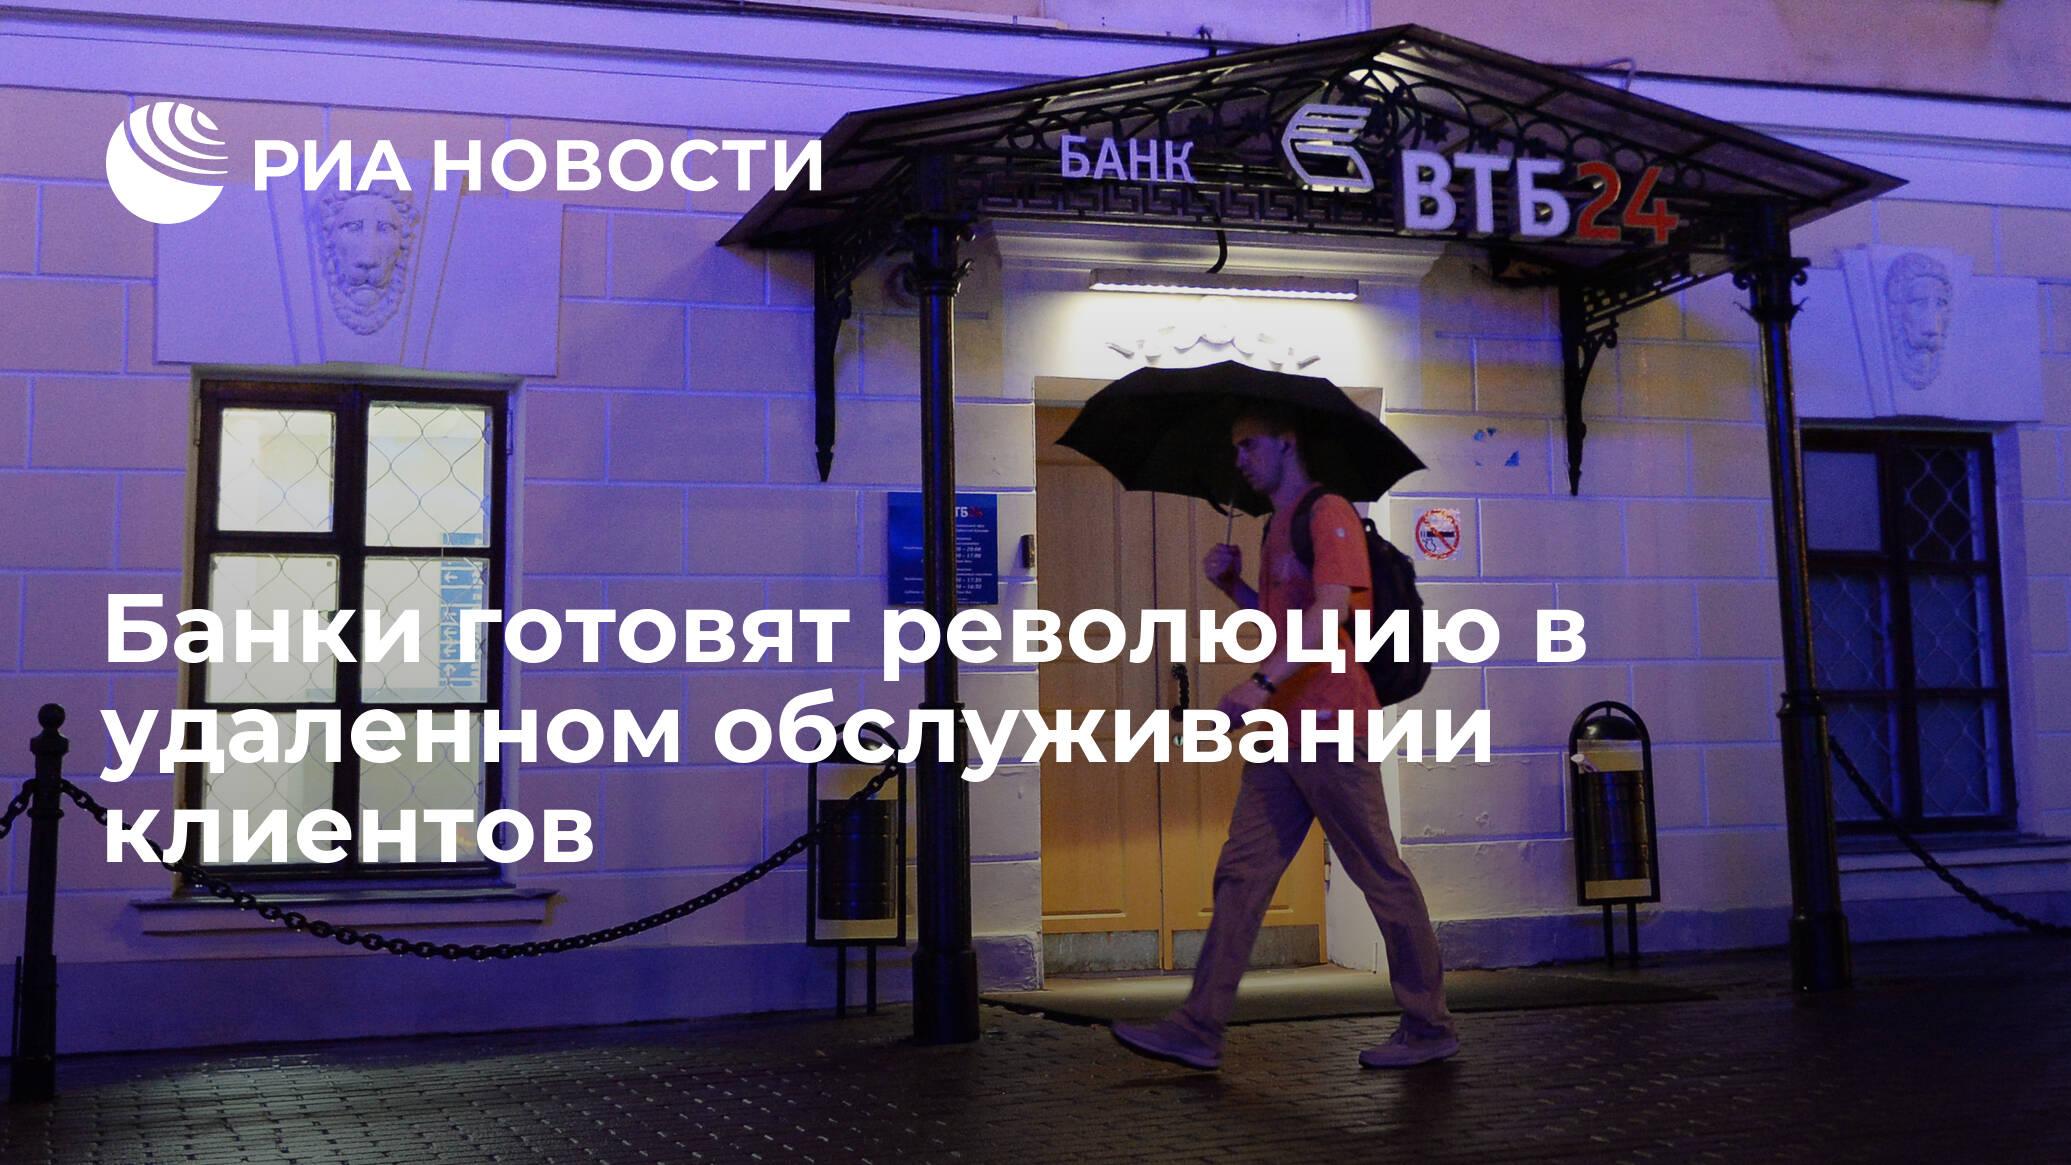 Банкомат хоум кредит чебоксары адреса